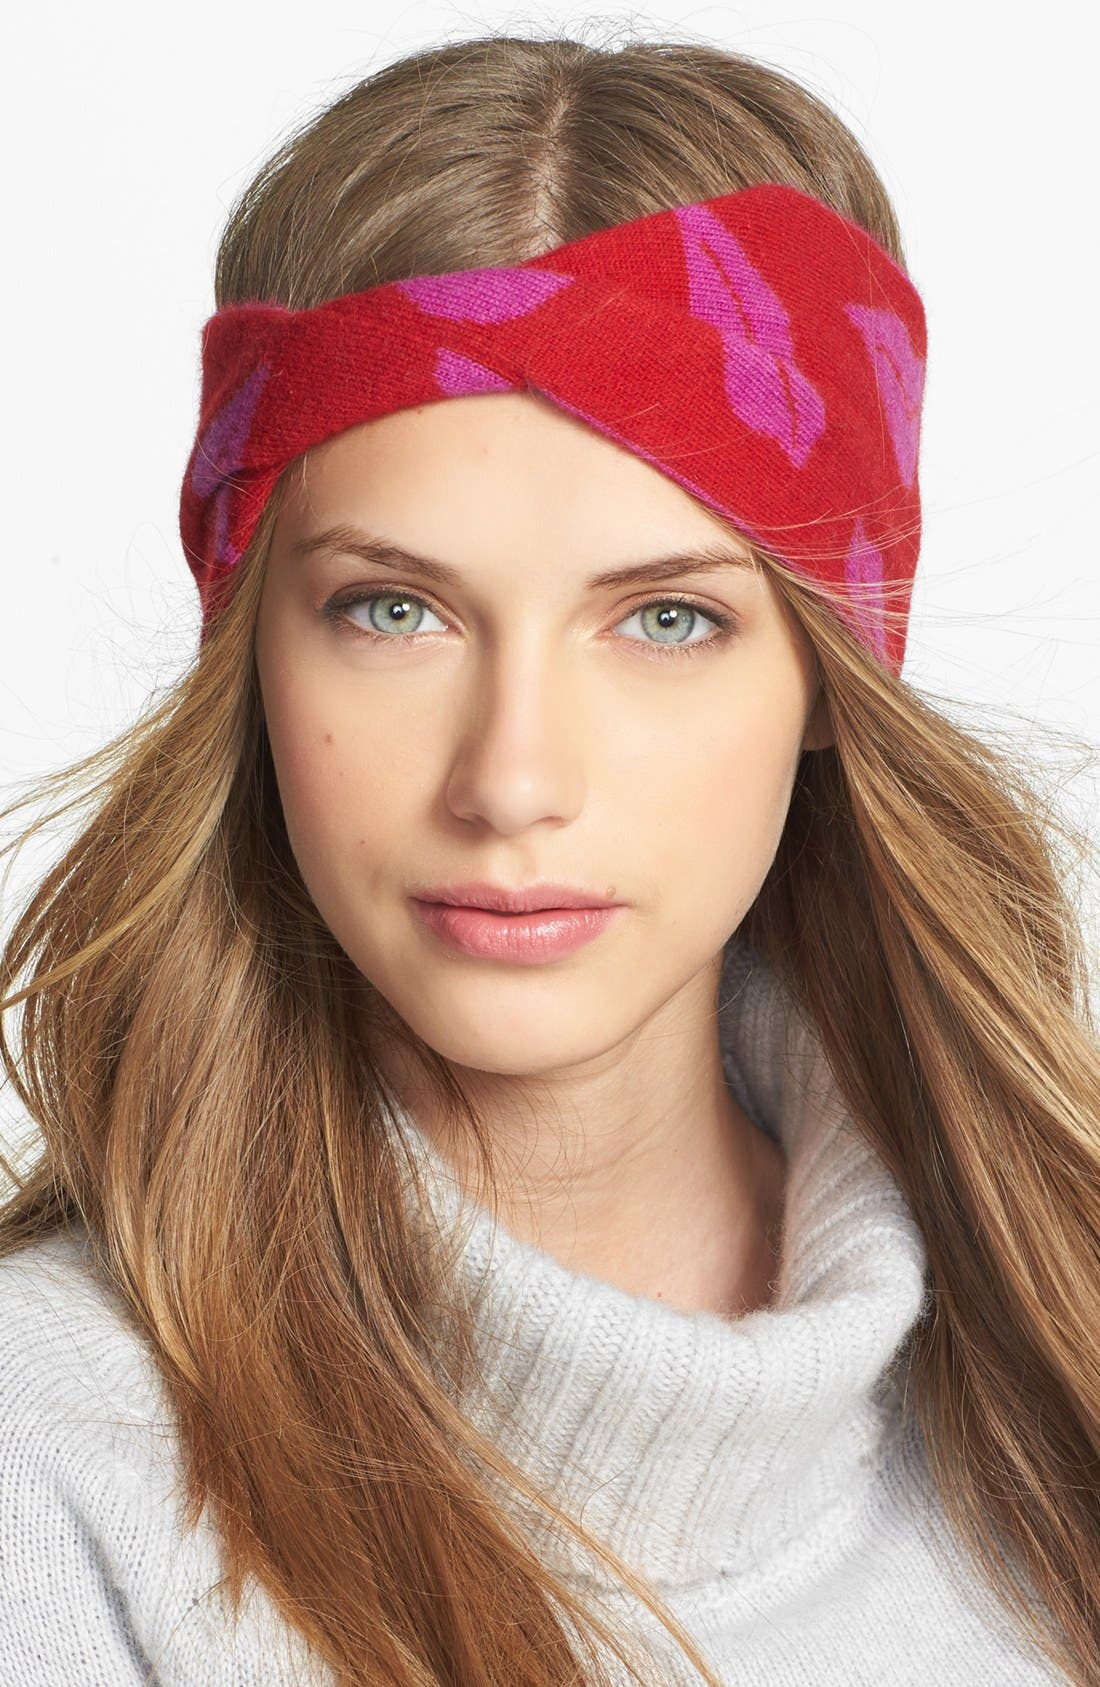 Alternate Image 1 Selected - Diane von Furstenberg 'Chloe - Iconic Lips' Head Wrap